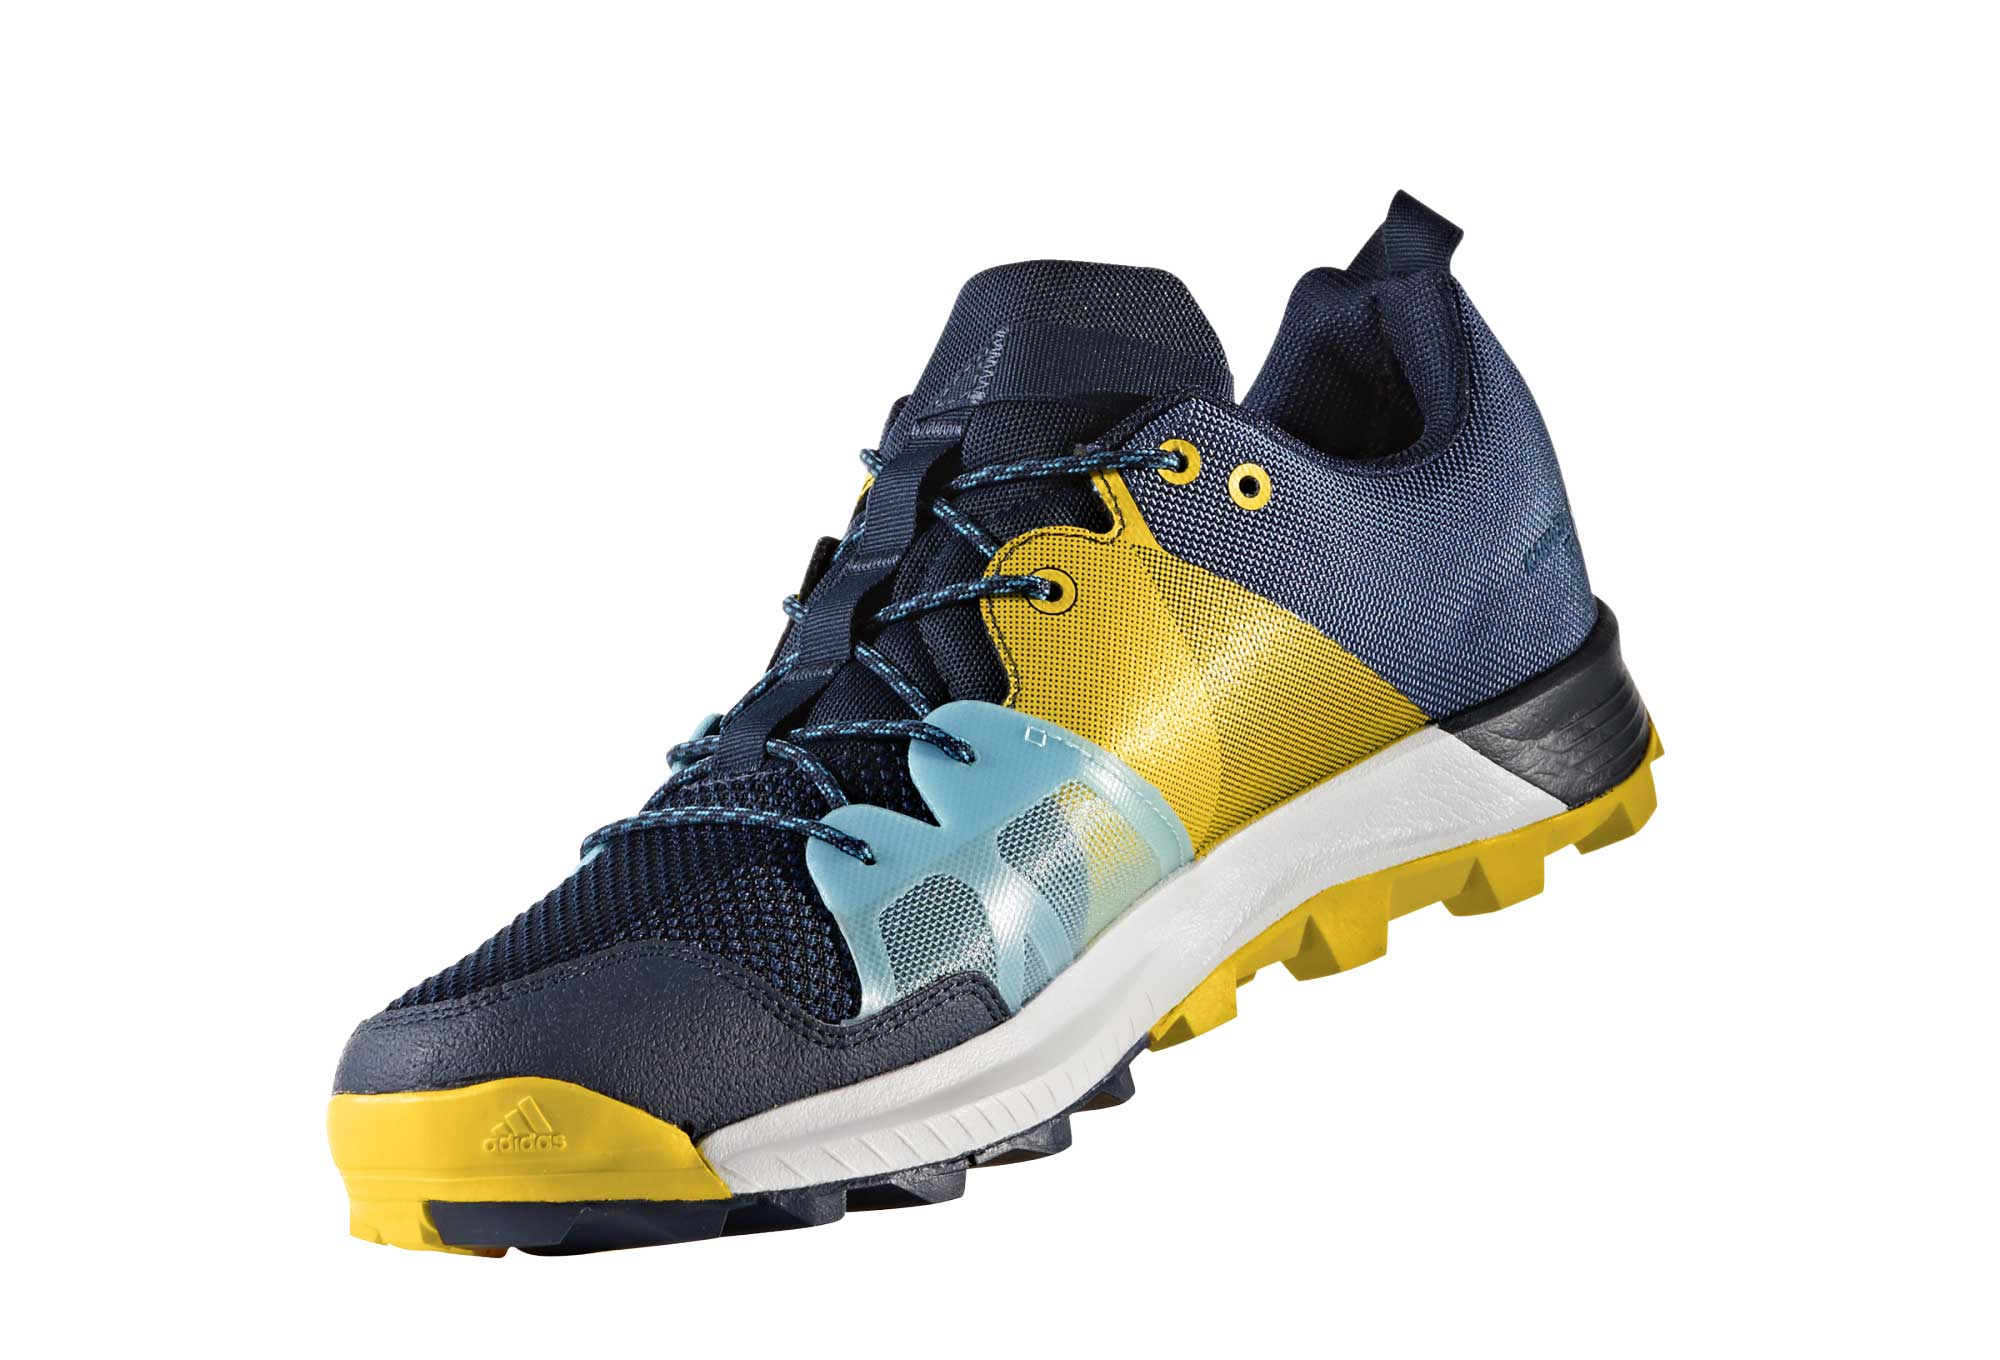 100% authentic 73257 447d9 Zapatillas adidas running Kanadia 8.1 Trail para Hombre